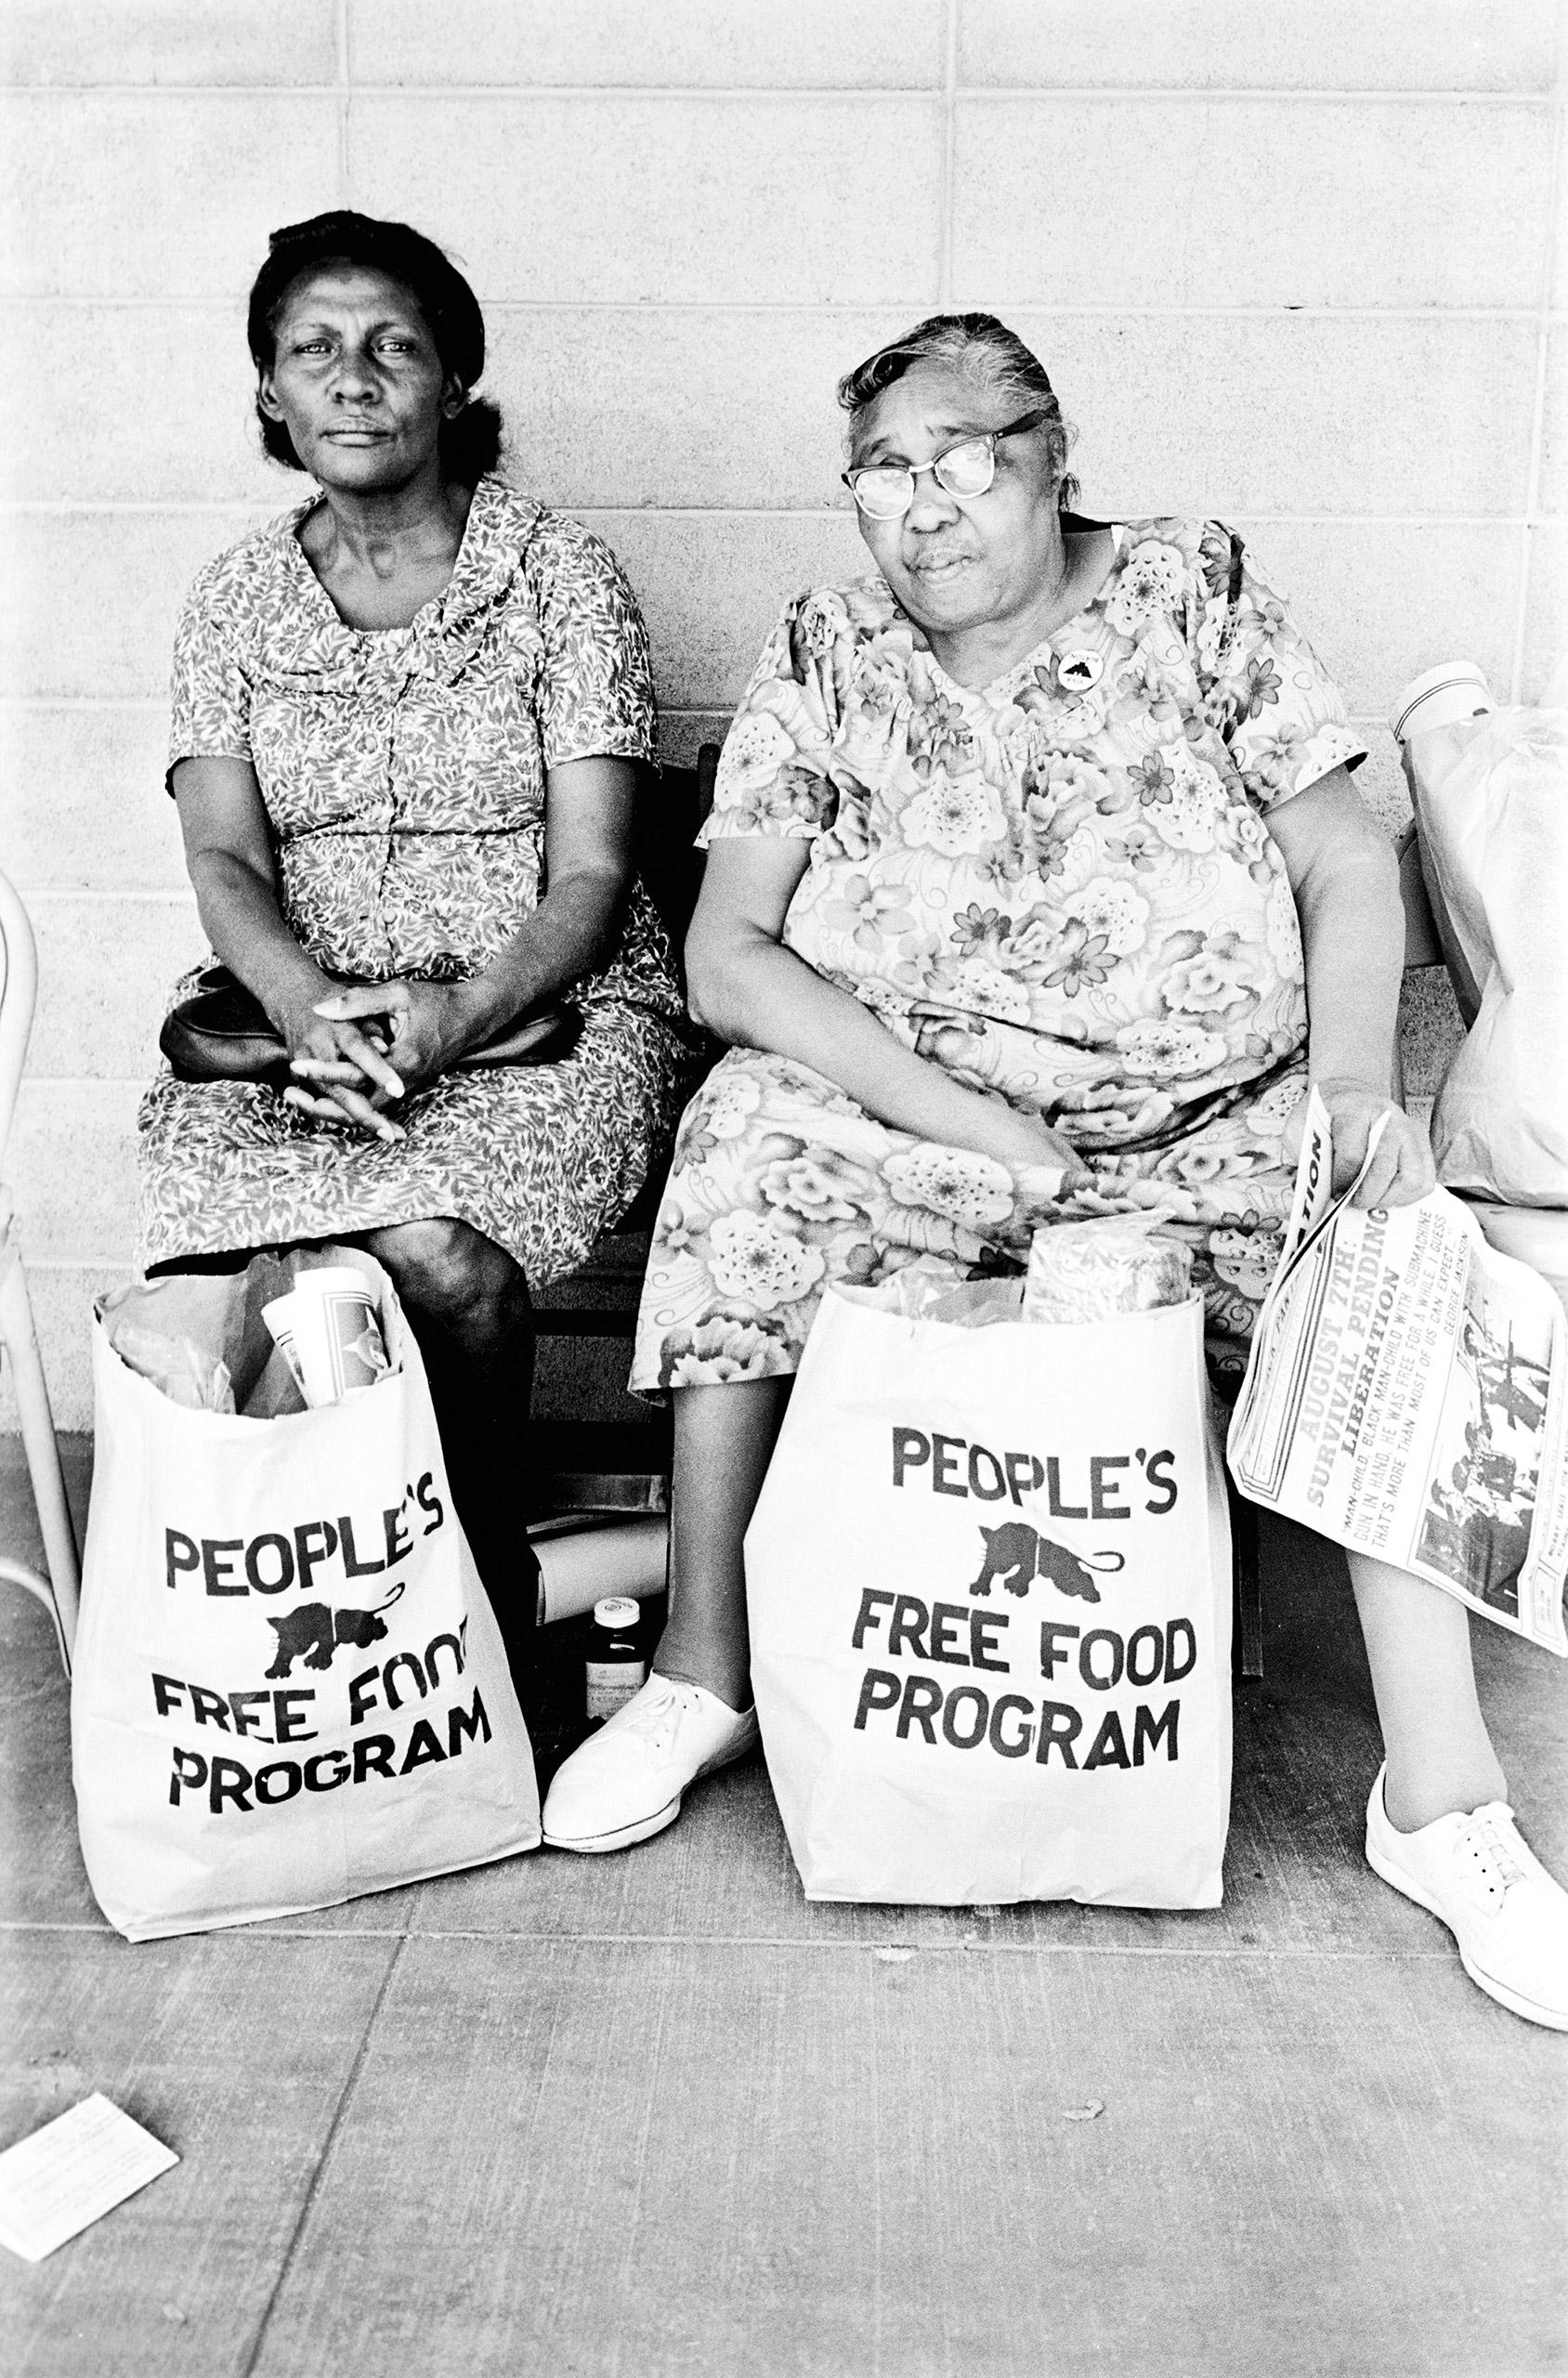 People's Free Food Program, Palo Alto, 1972.